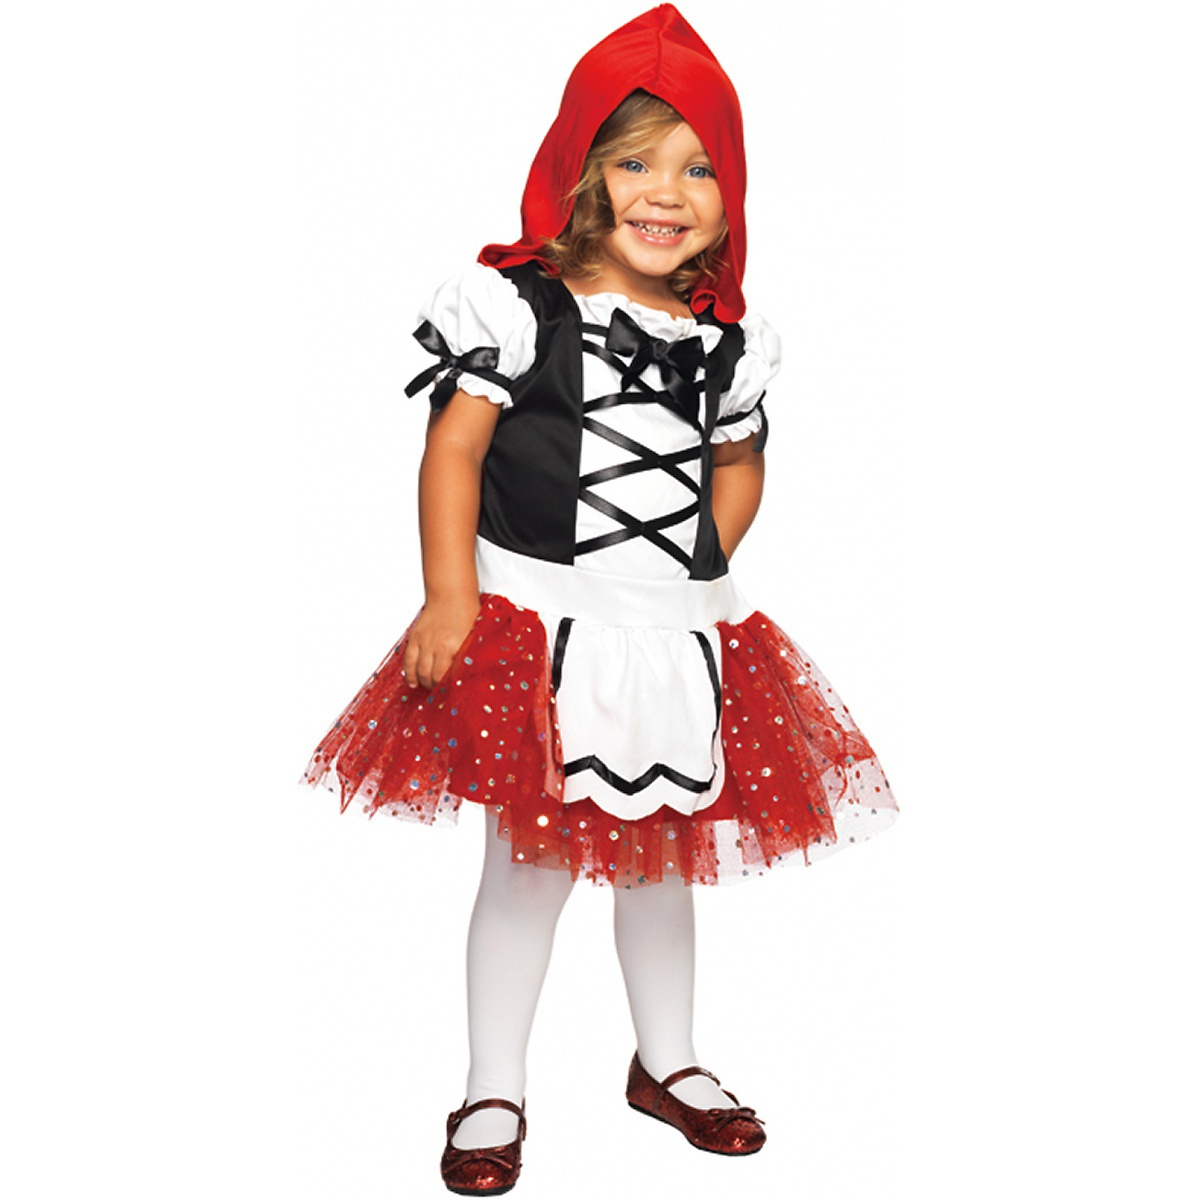 Leg Avenue, Inc. Red Riding Hood Toddler Girls Little Cutie Halloween Costume at Sears.com